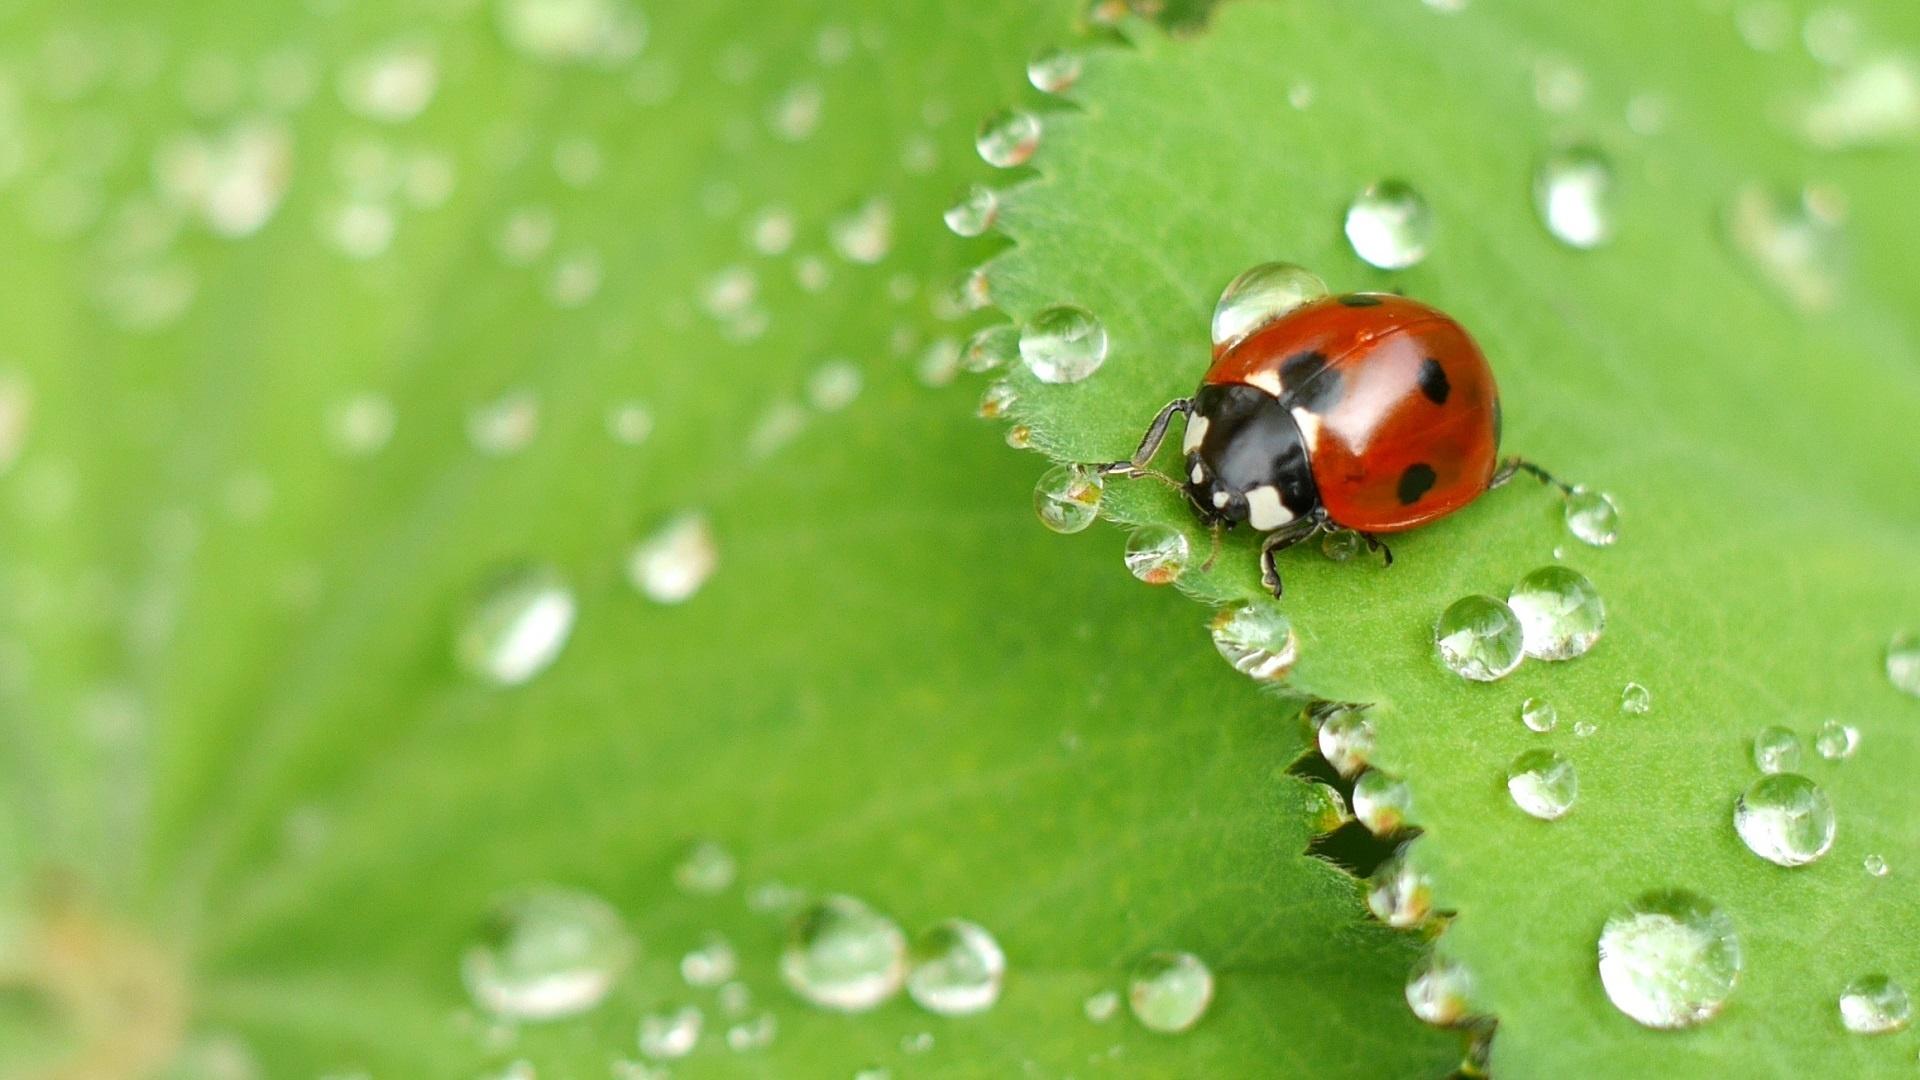 Ladybug and dew drops on a green leaf